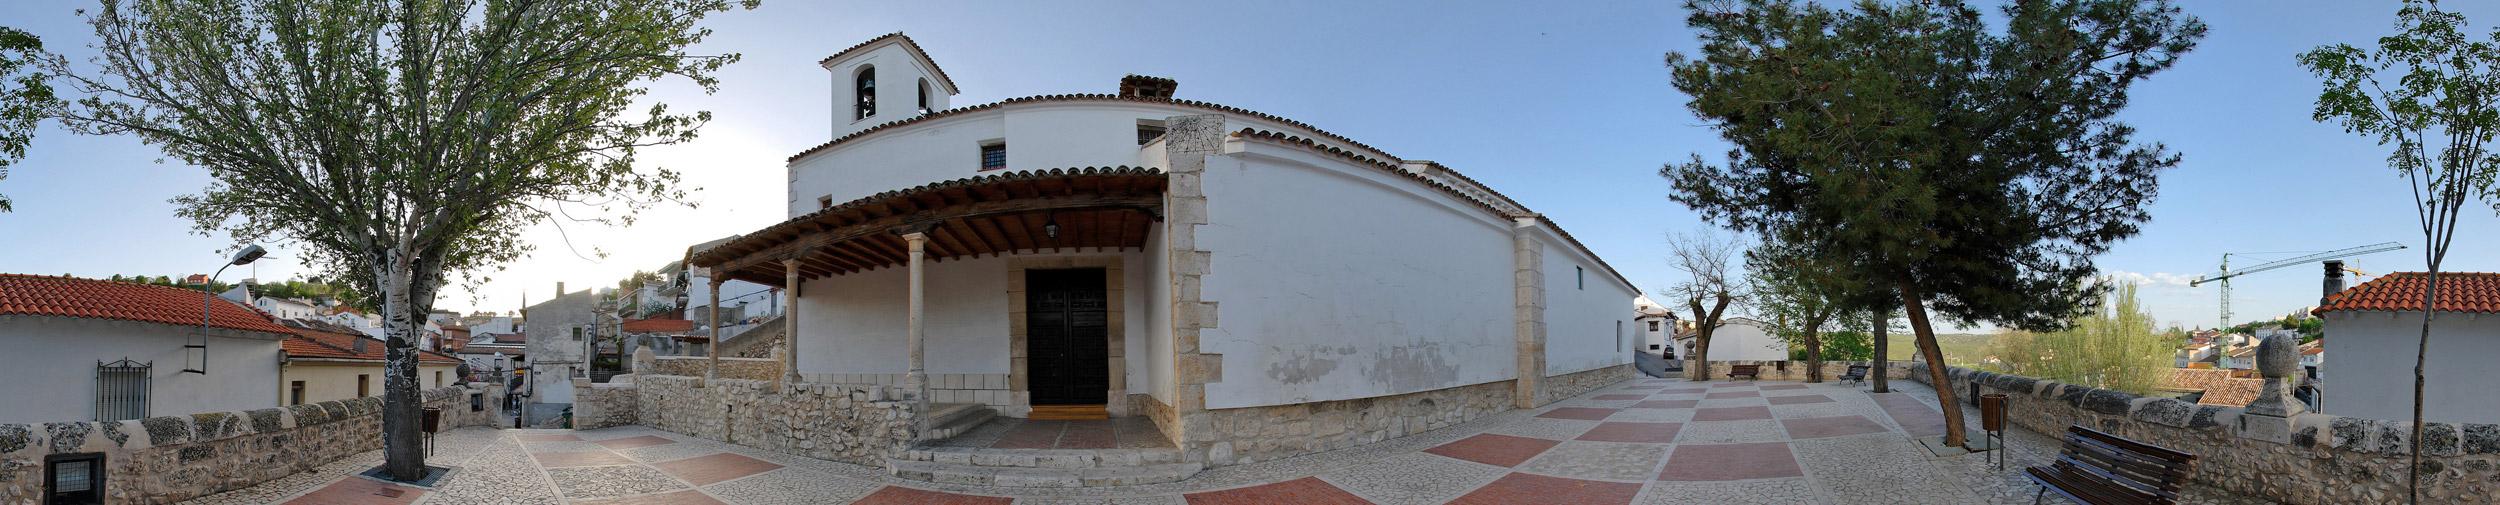 cabecera valdelaguna